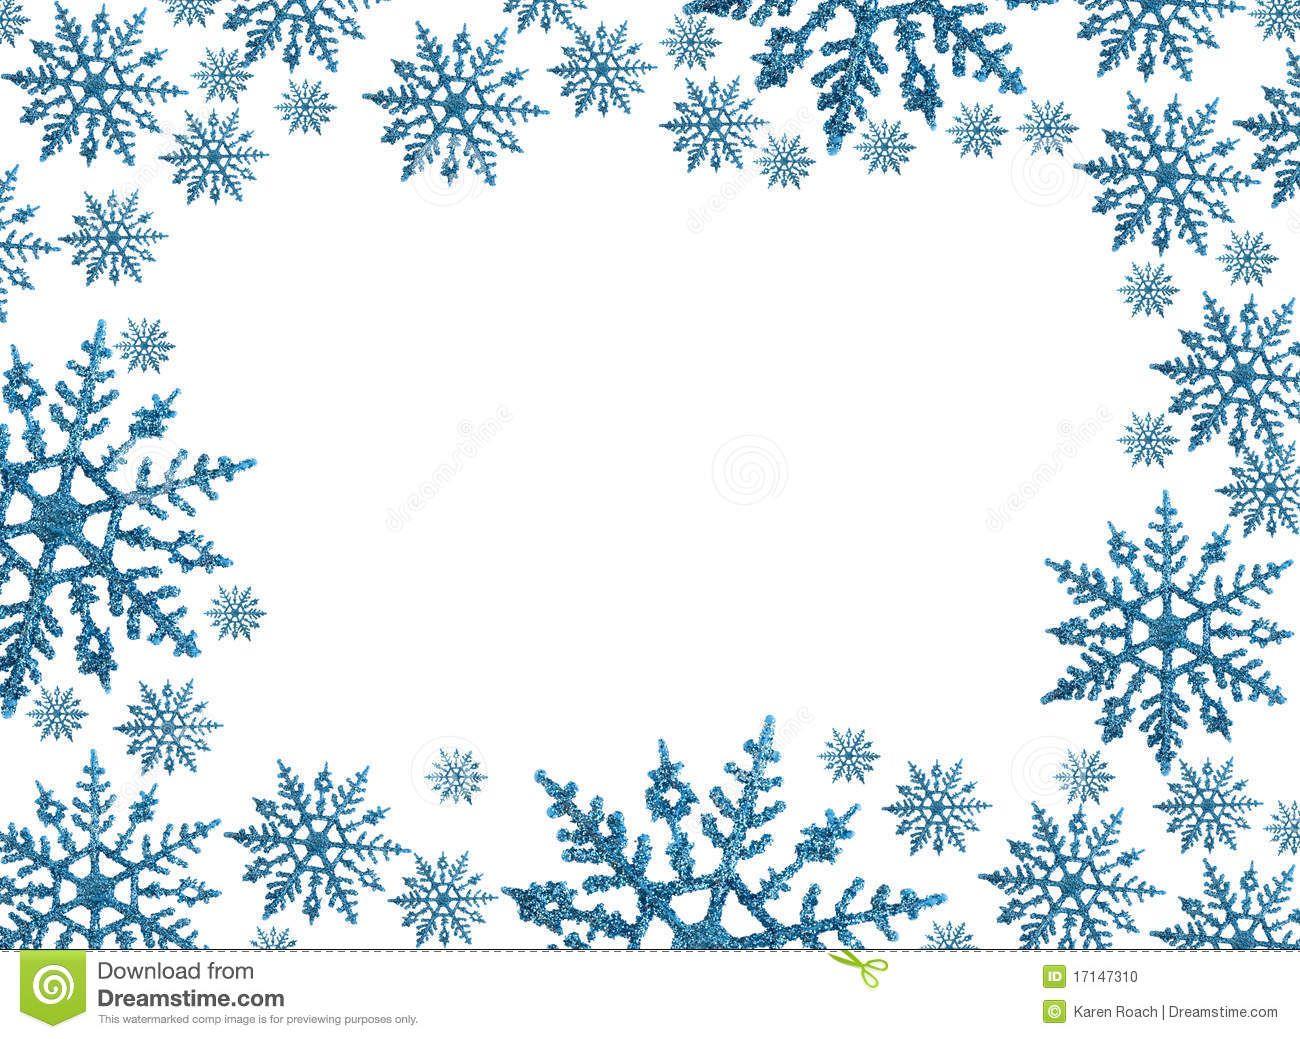 Cutting Machine Art SVG CLIPART Winter Snowflake Border Instant Download